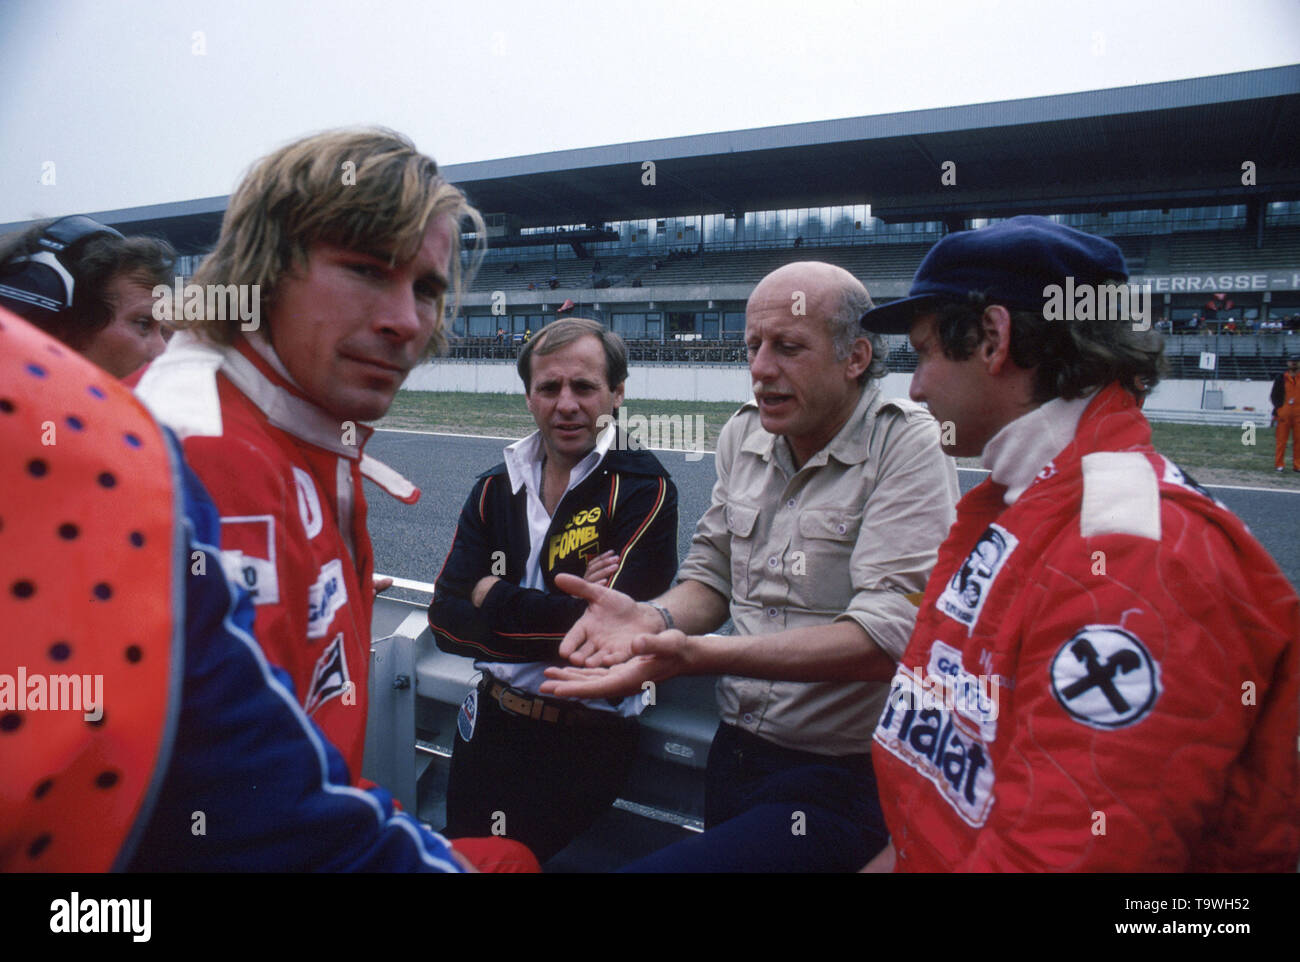 Formula 1, Grand Prix Germany 1977, Hockenheimring, 31.07.1977 pit lane James Hunt Guenter Schmid, ATS Mike Kranefuss, Ford Niki Lauda www.hoch-zwei.net, copyright: HOCH ZWEI/Ronco | usage worldwide - Stock Image